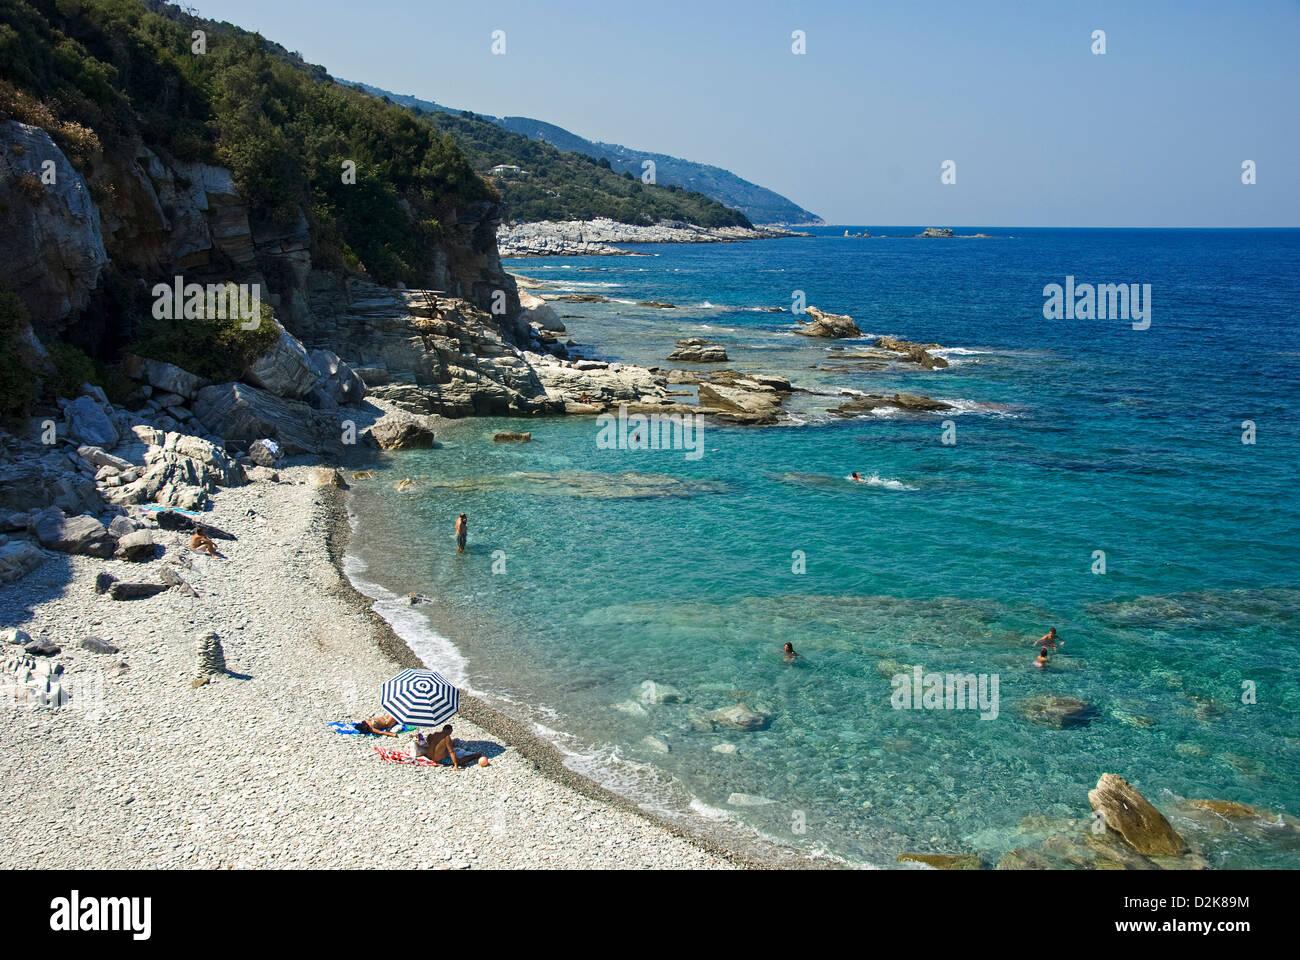 Aegean Bay (Pelion Peninsula, Thessaly, Greece) Stock Photo